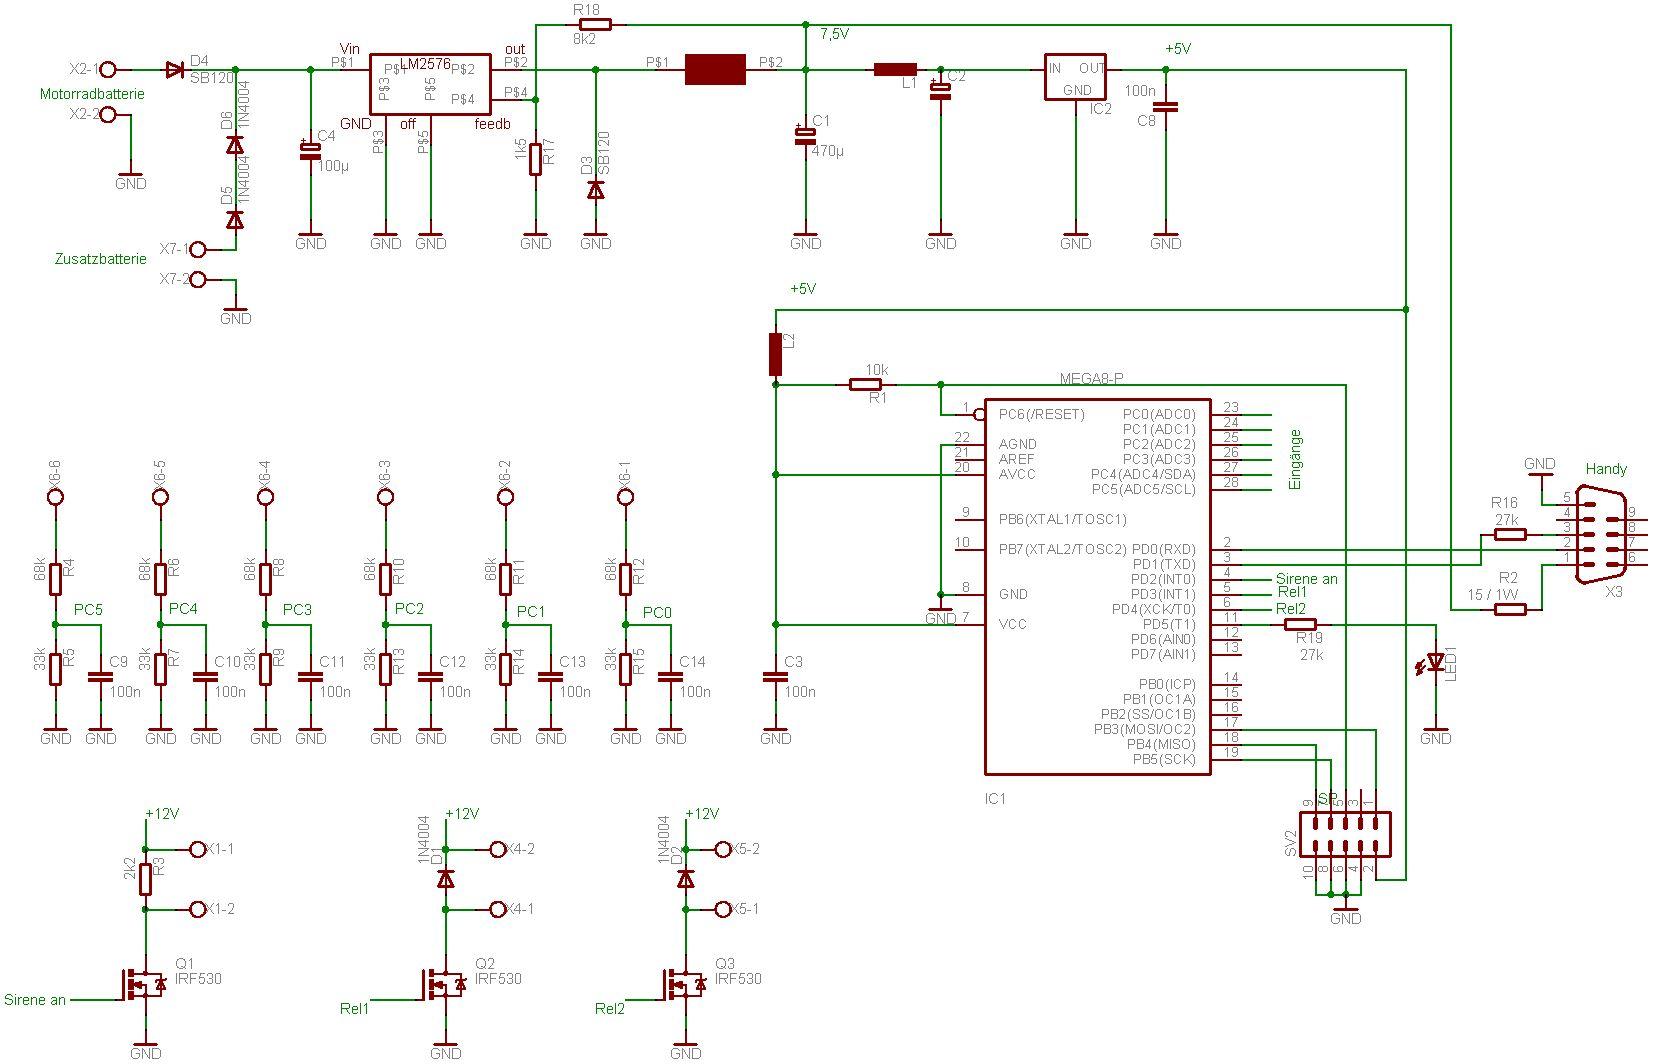 bewegungsmelder schaltung elektronik schaltung bewegungsmelder 39 cerberus 39 elektronik und e. Black Bedroom Furniture Sets. Home Design Ideas